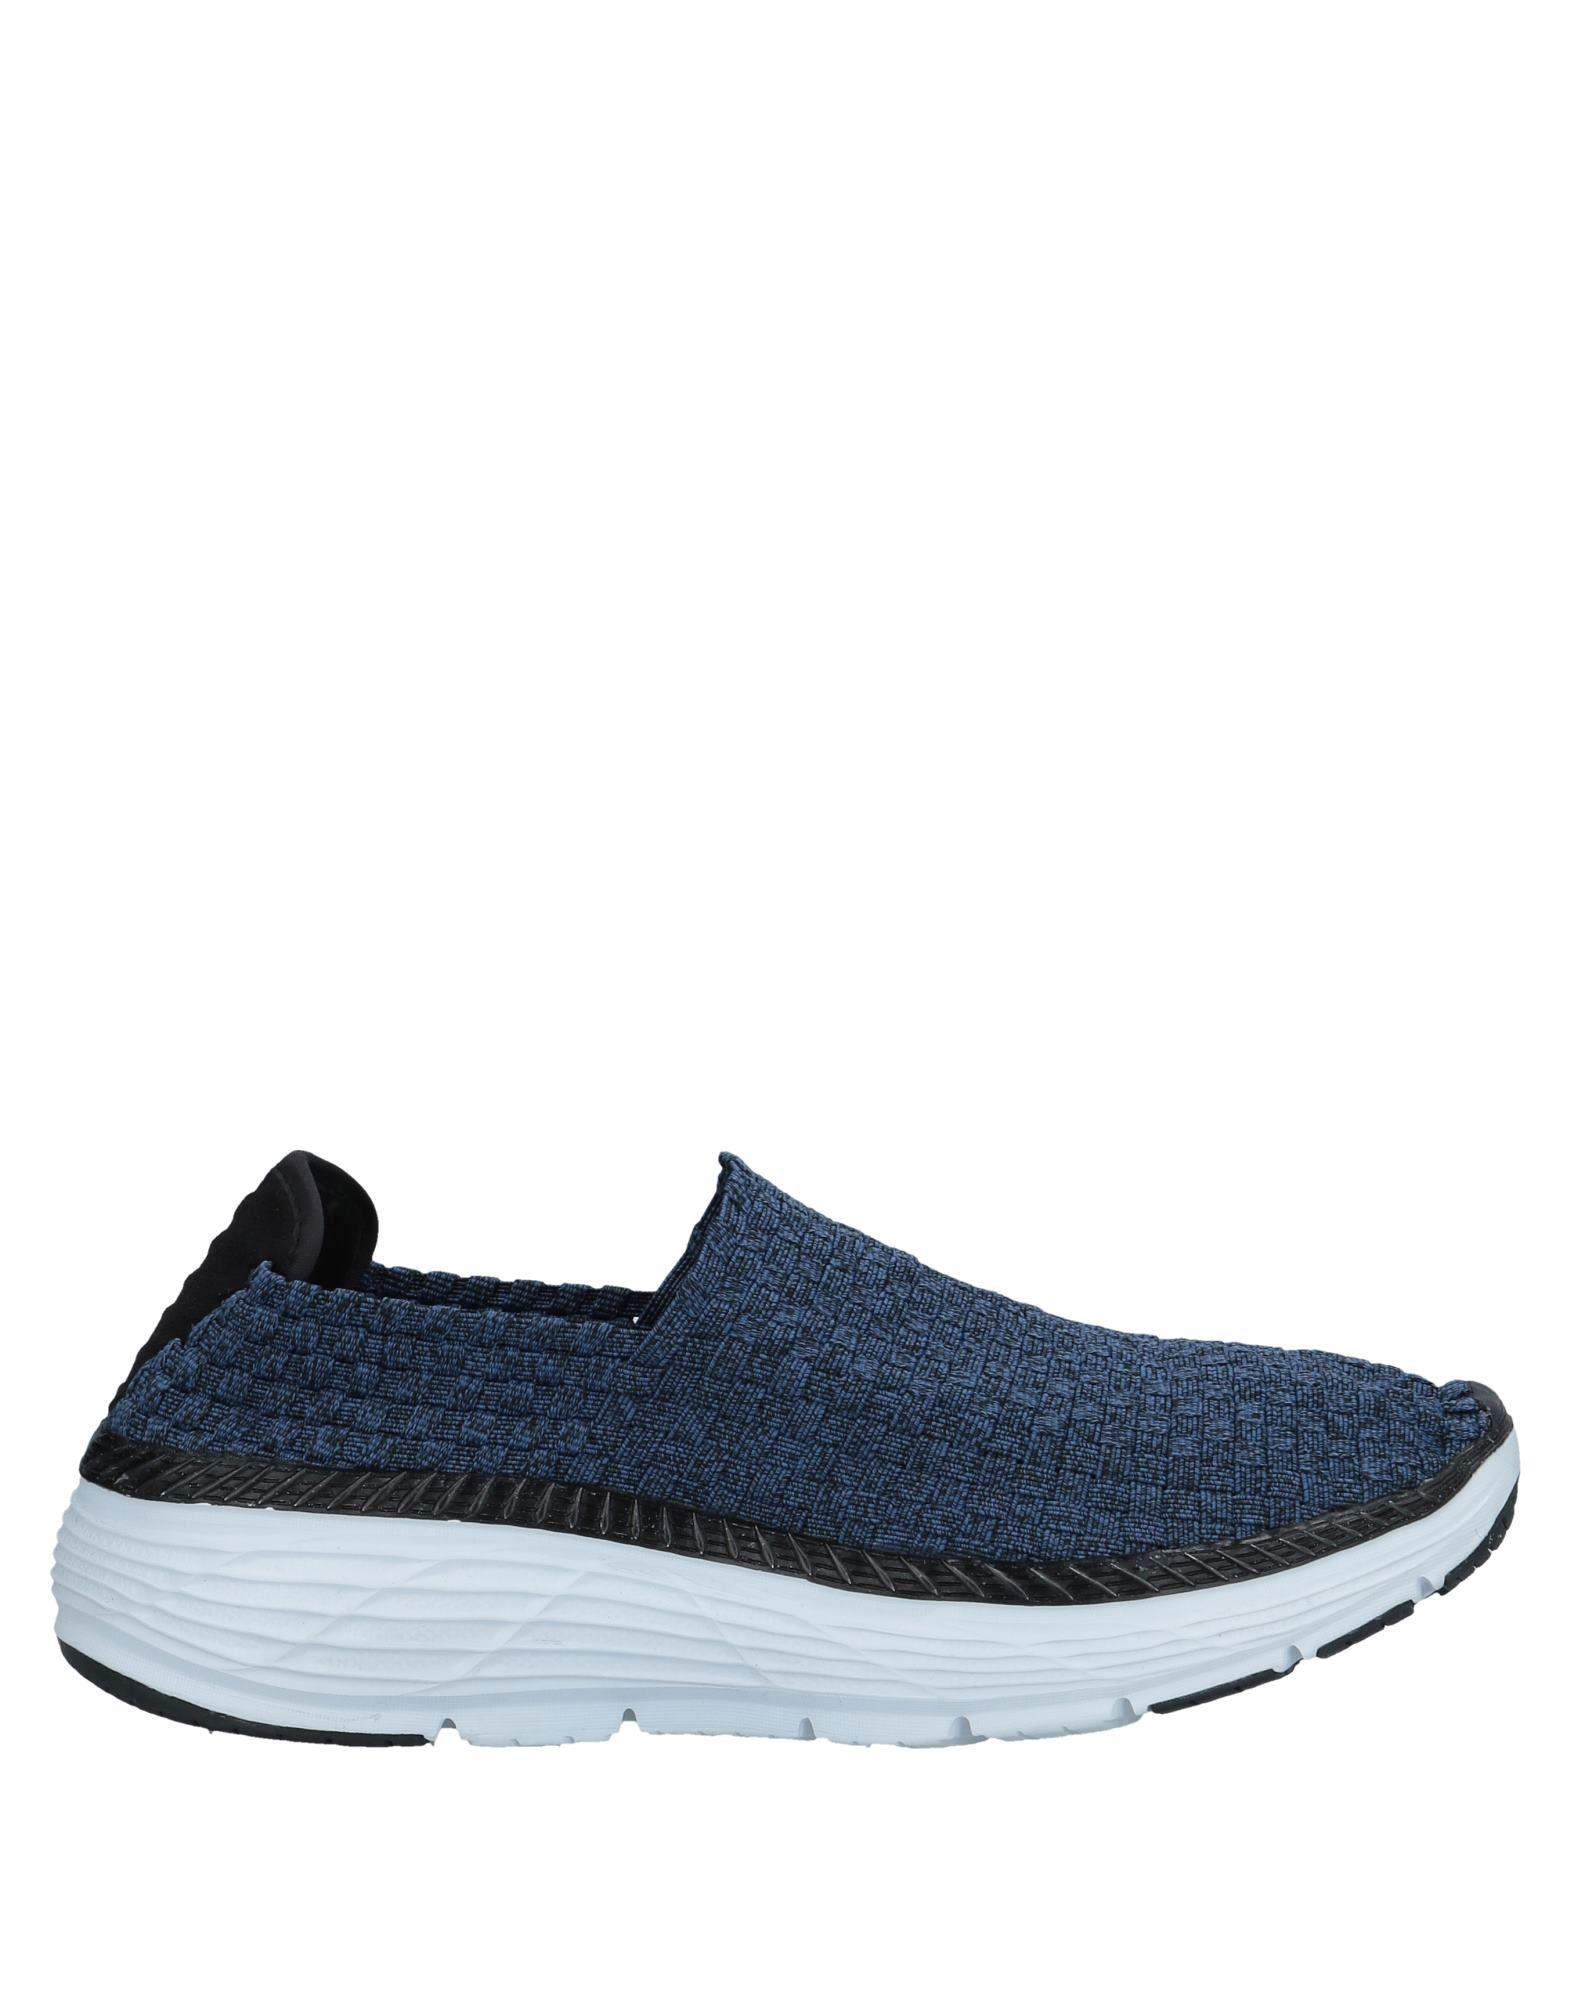 Sneakers Rock Spring Donna - 11508475JI